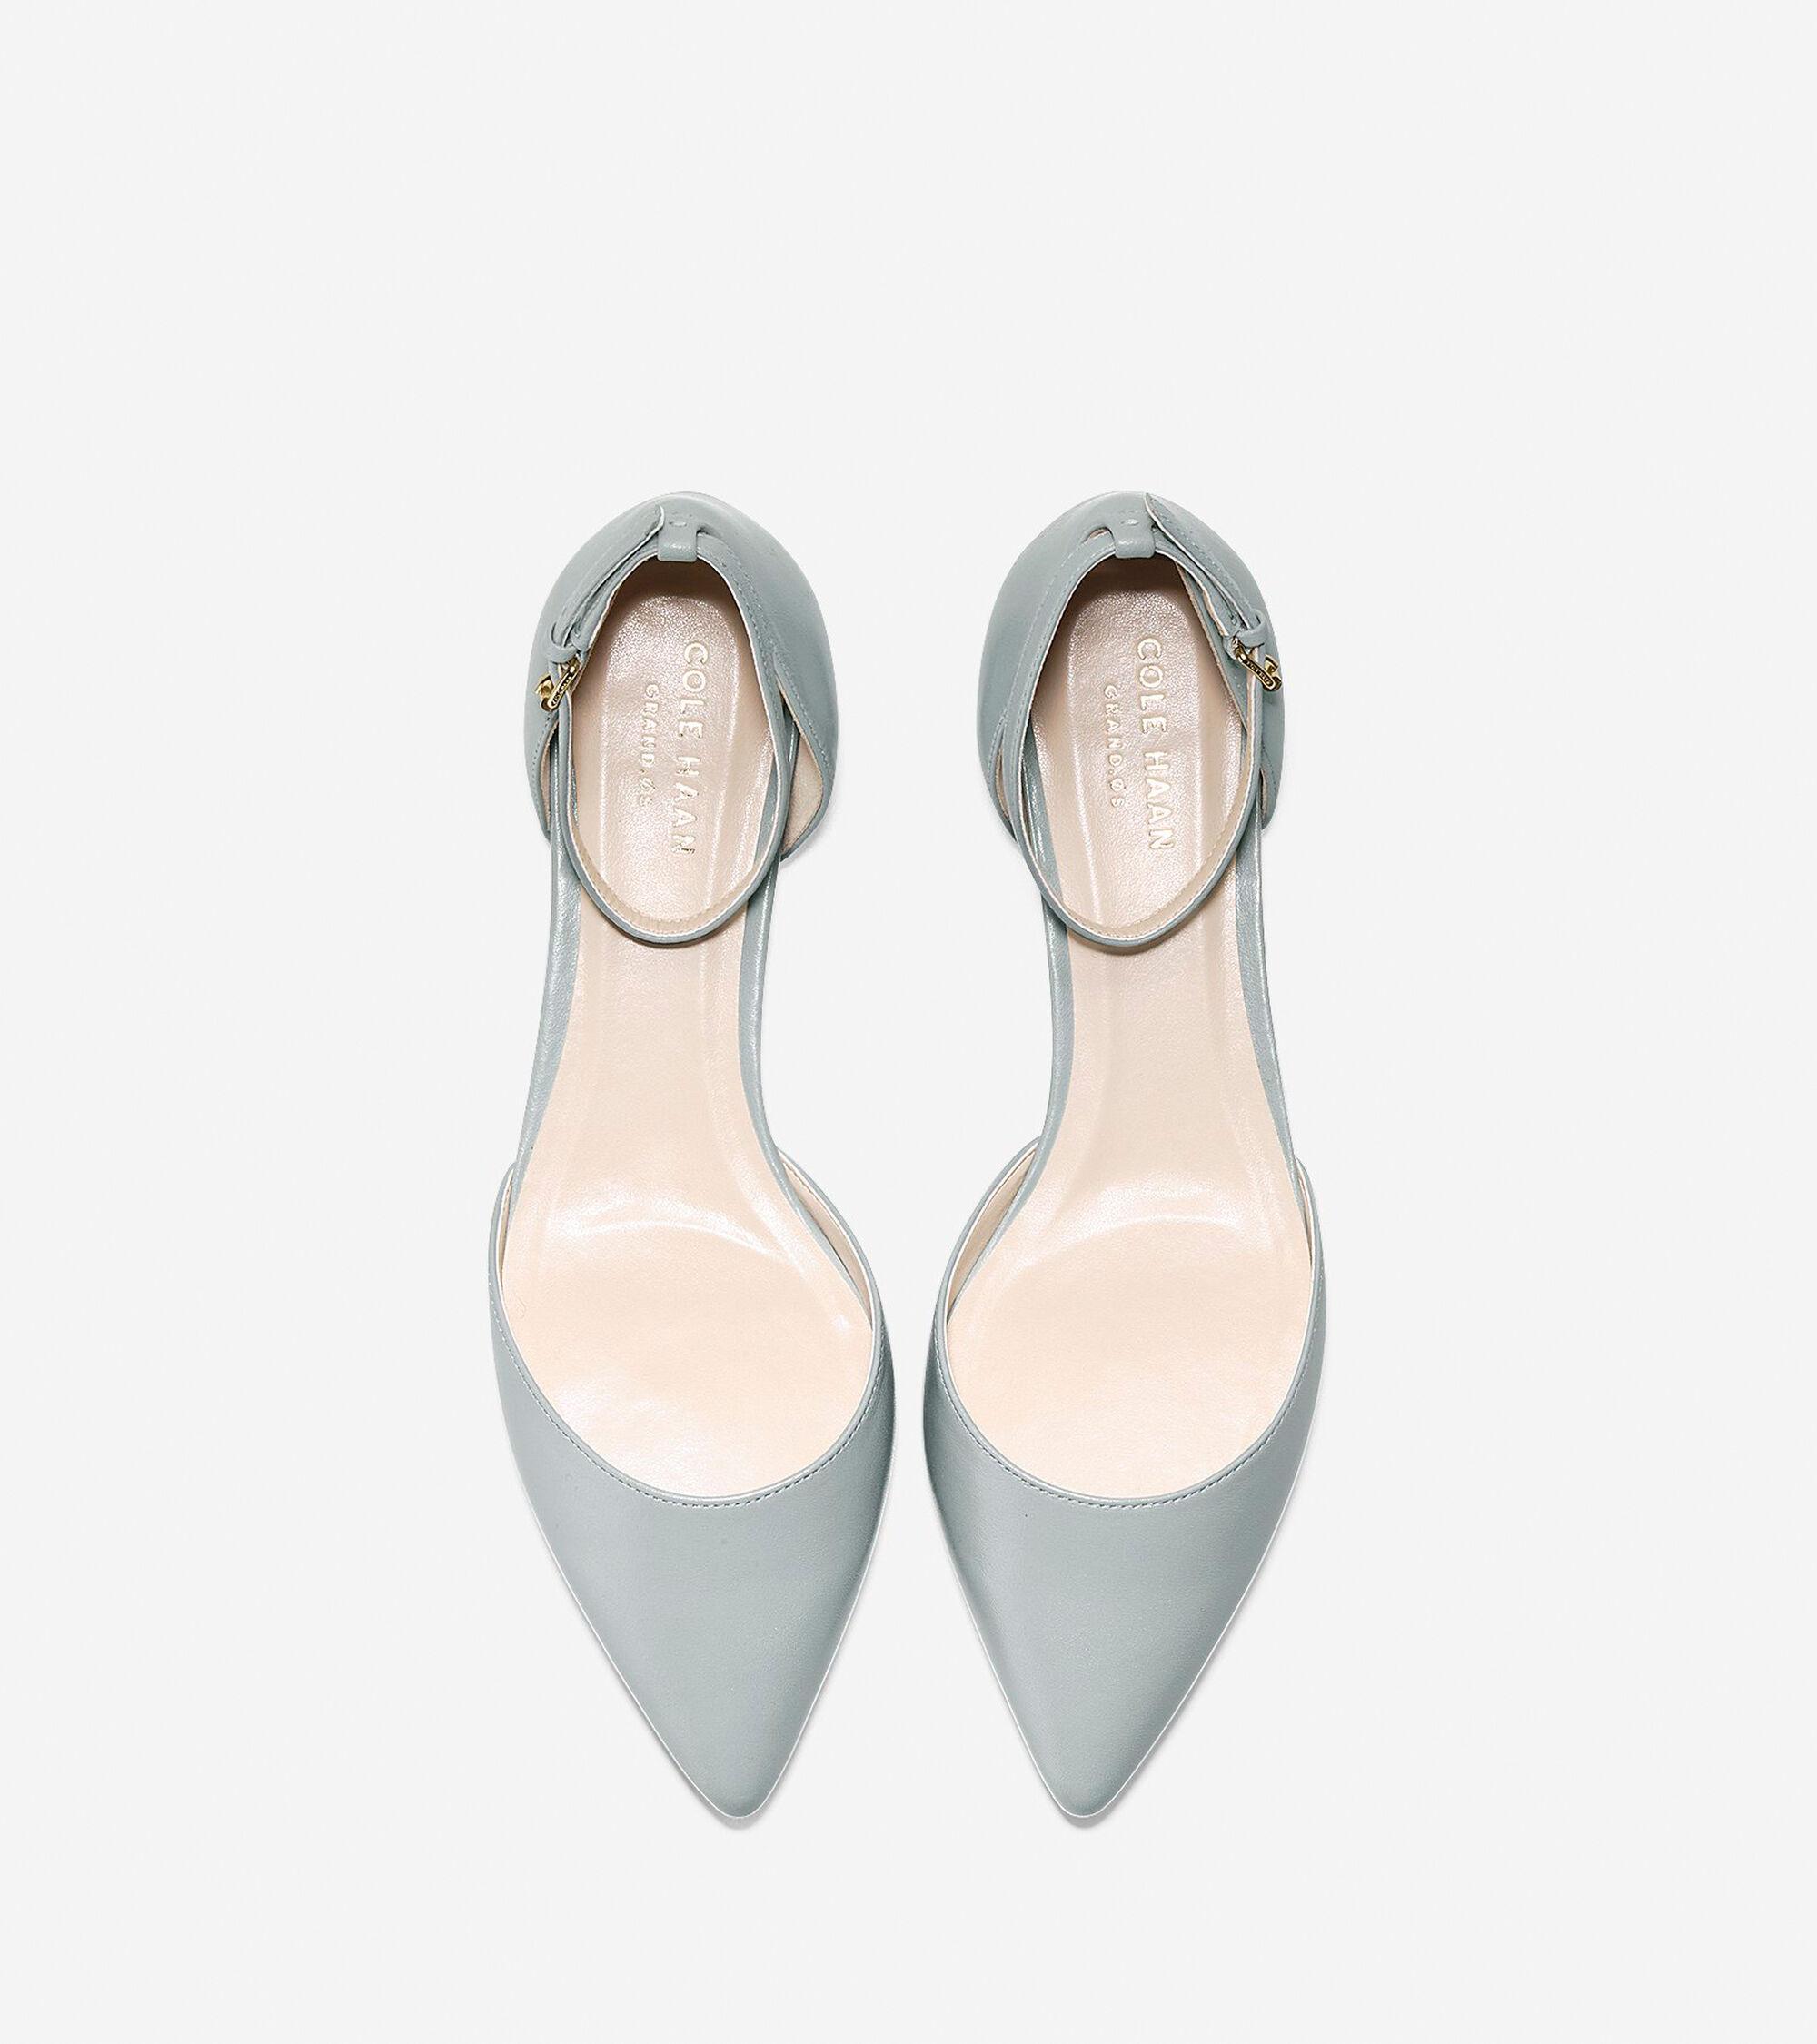 d36b0539f5fd Women s Abigail Grand Skimmers Flats in Silver Mist   Sale